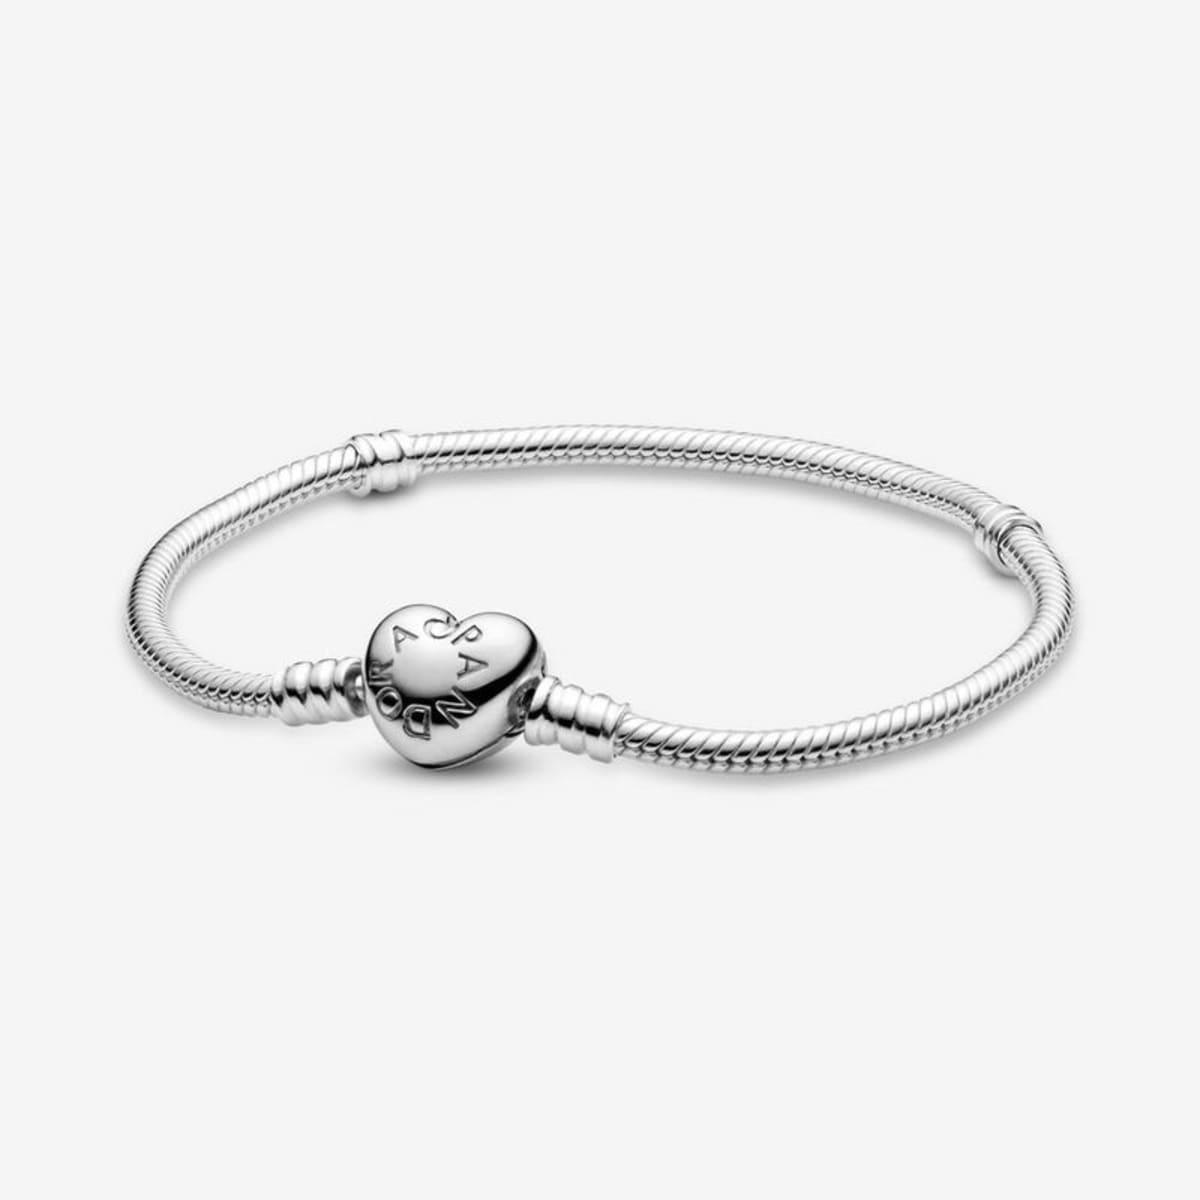 bracelet pandora 21 cm